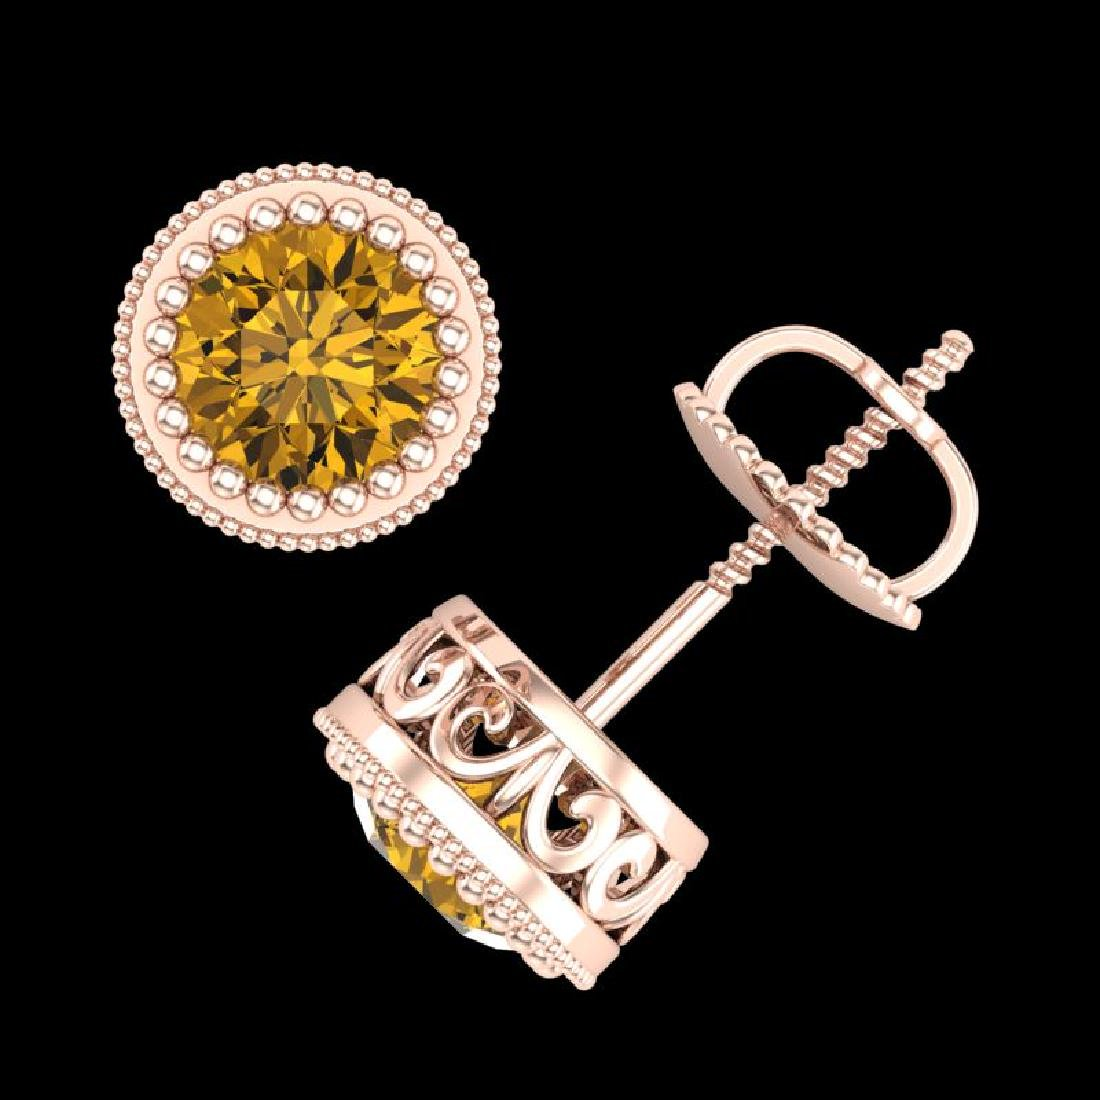 1.09 CTW Intense Fancy Yellow Diamond Art Deco Stud - 3